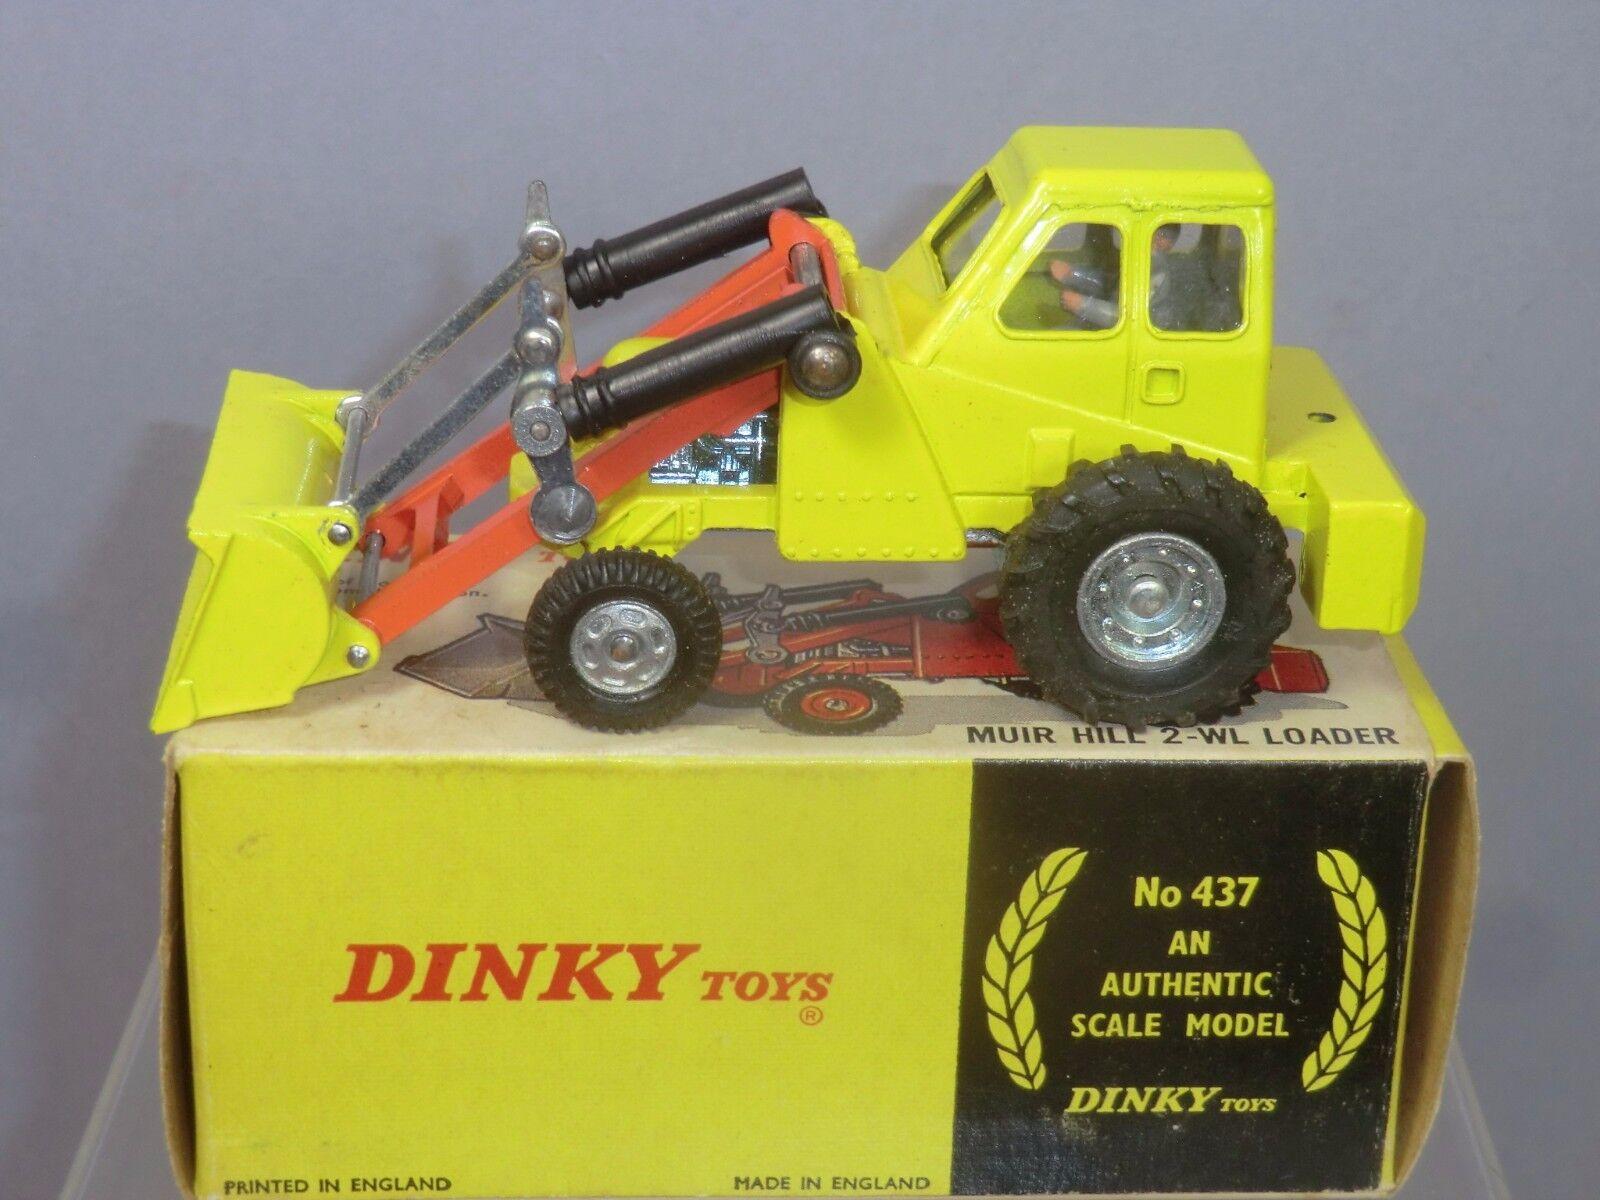 Dinky Juguetes No.437  Muir Hill  2 WL Cochegador  Taylor Woodrow  3rd edición VN MIB